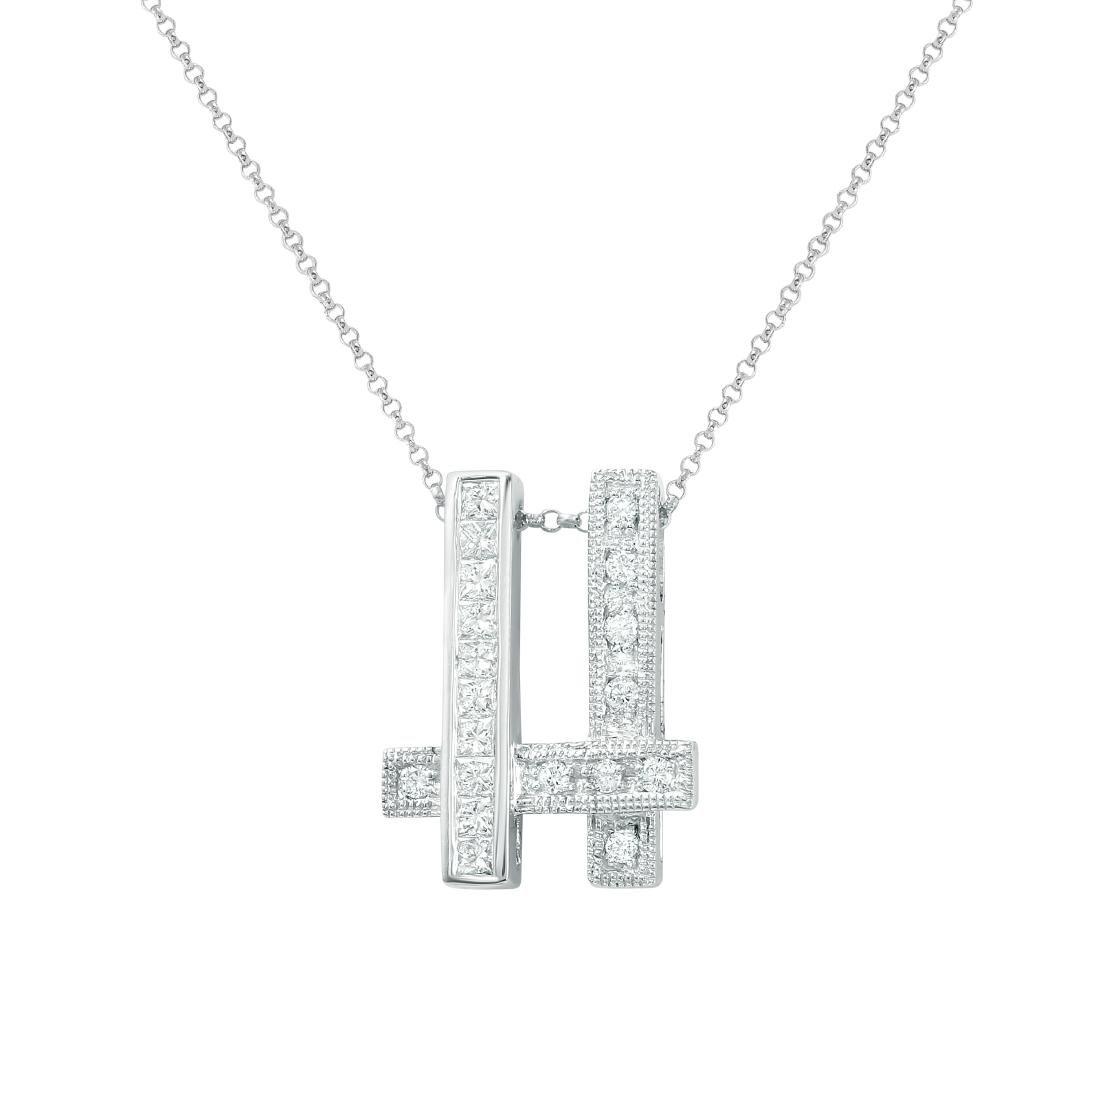 14KT White Gold Ladies Slider with Chain